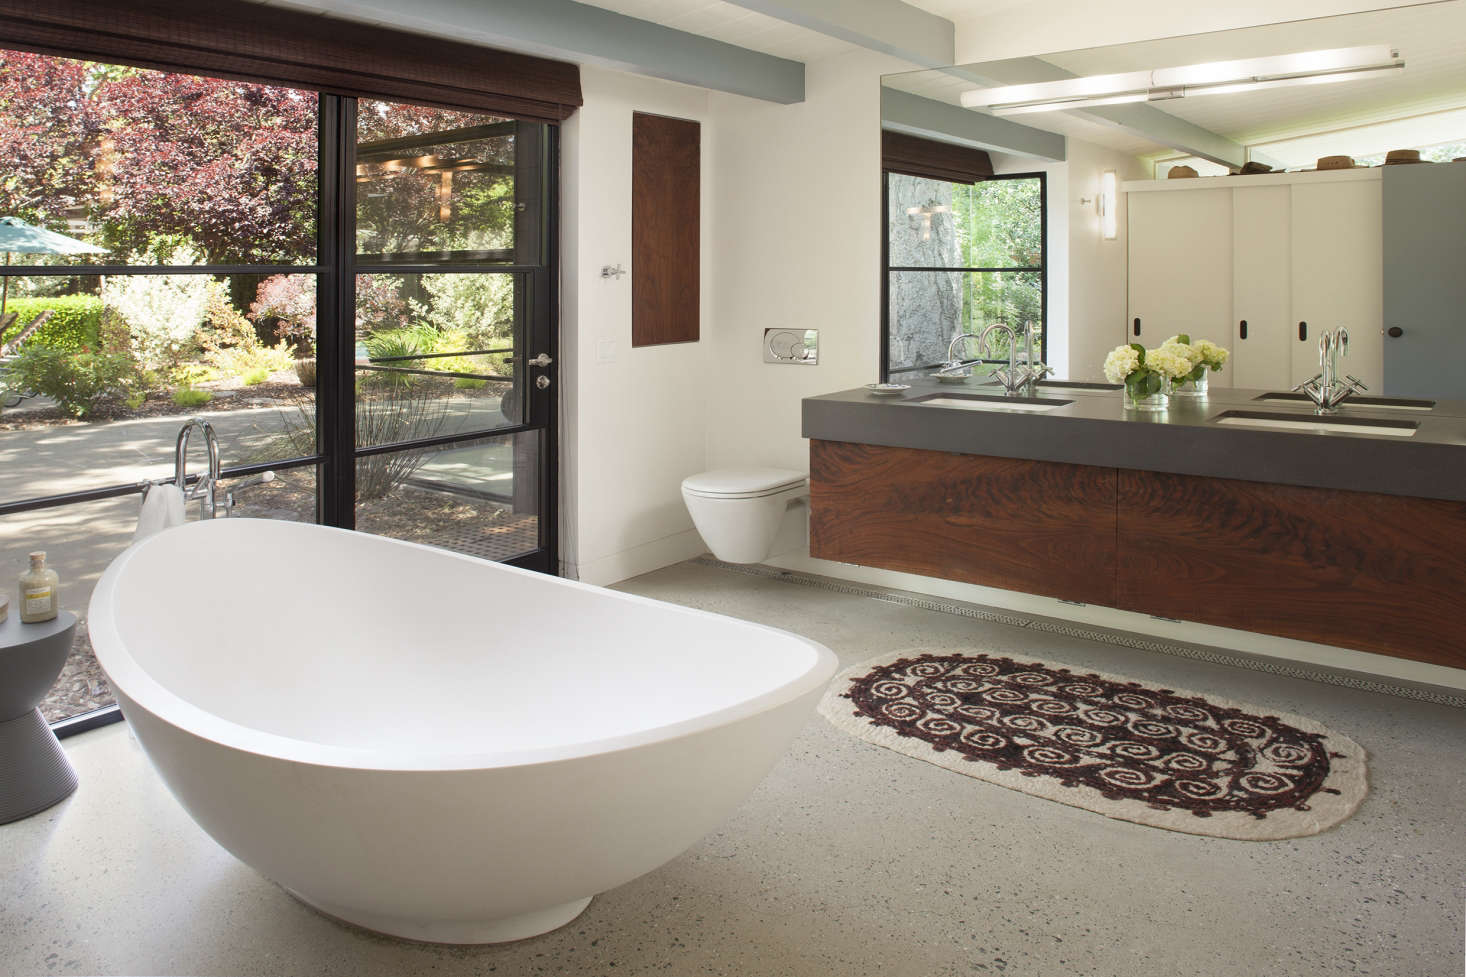 menlo oaks 3 bath